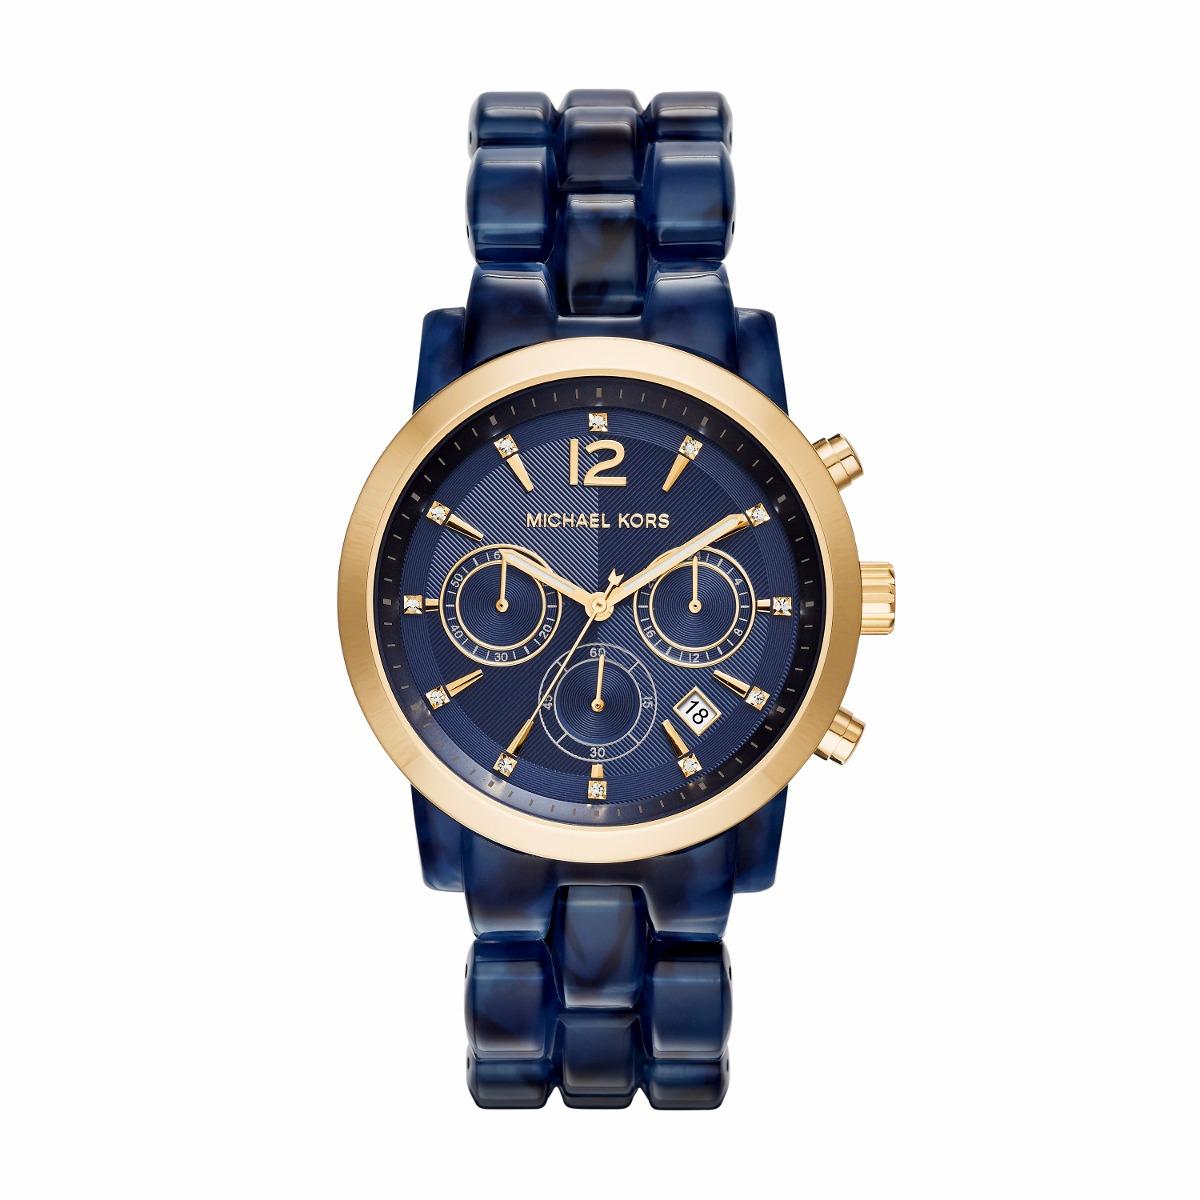 fc4769d4240c reloj michael kors mk6236 mujer cristales azul. Cargando zoom.